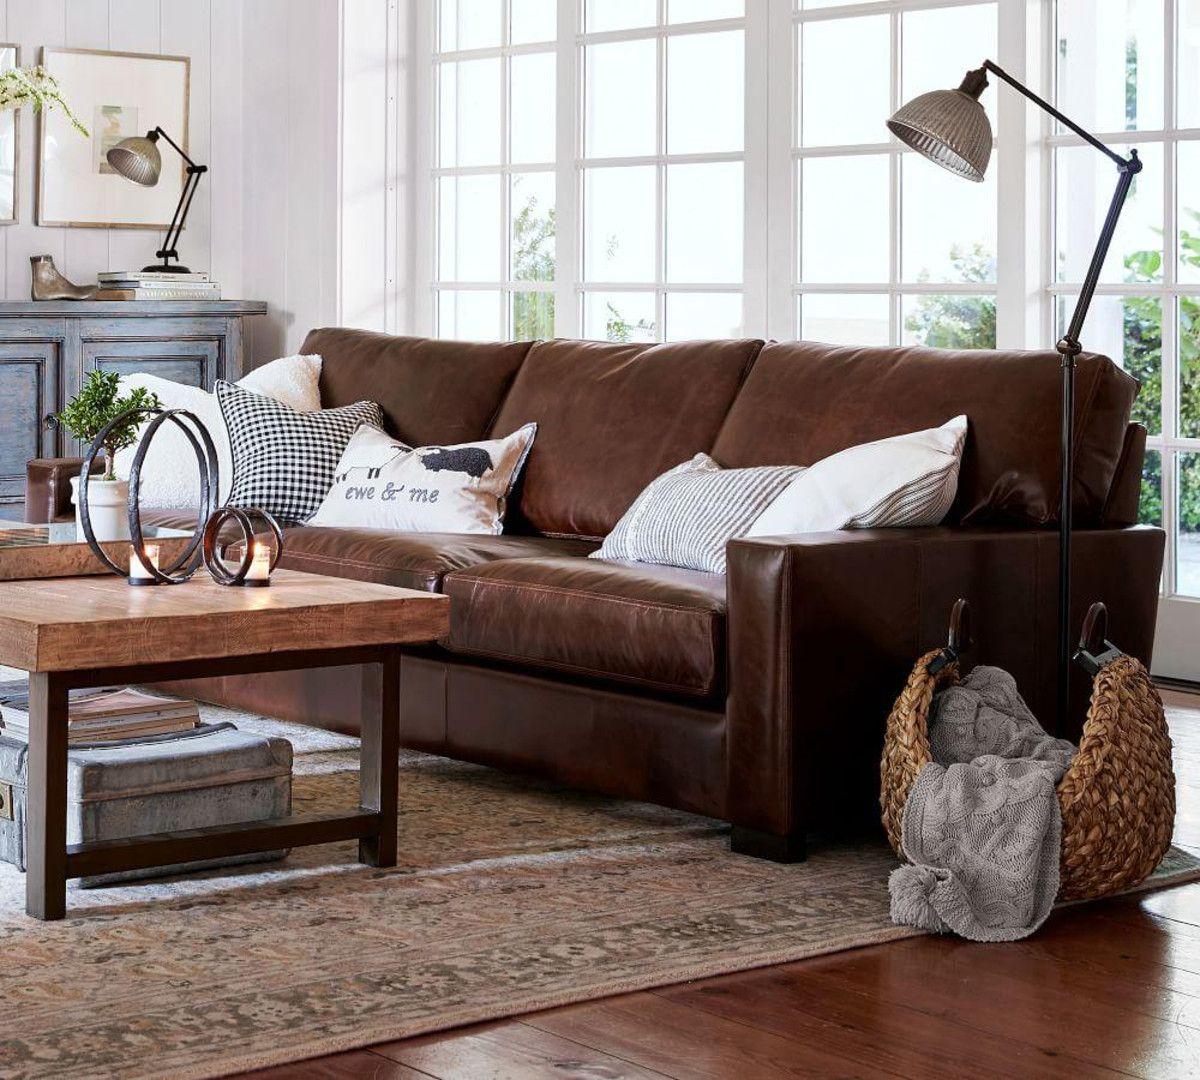 Turner Square Arm Leather Sofa Burnished Walnut 217 Cm Living Room Leather Brown Living Room Brown Leather Sofa Living Room